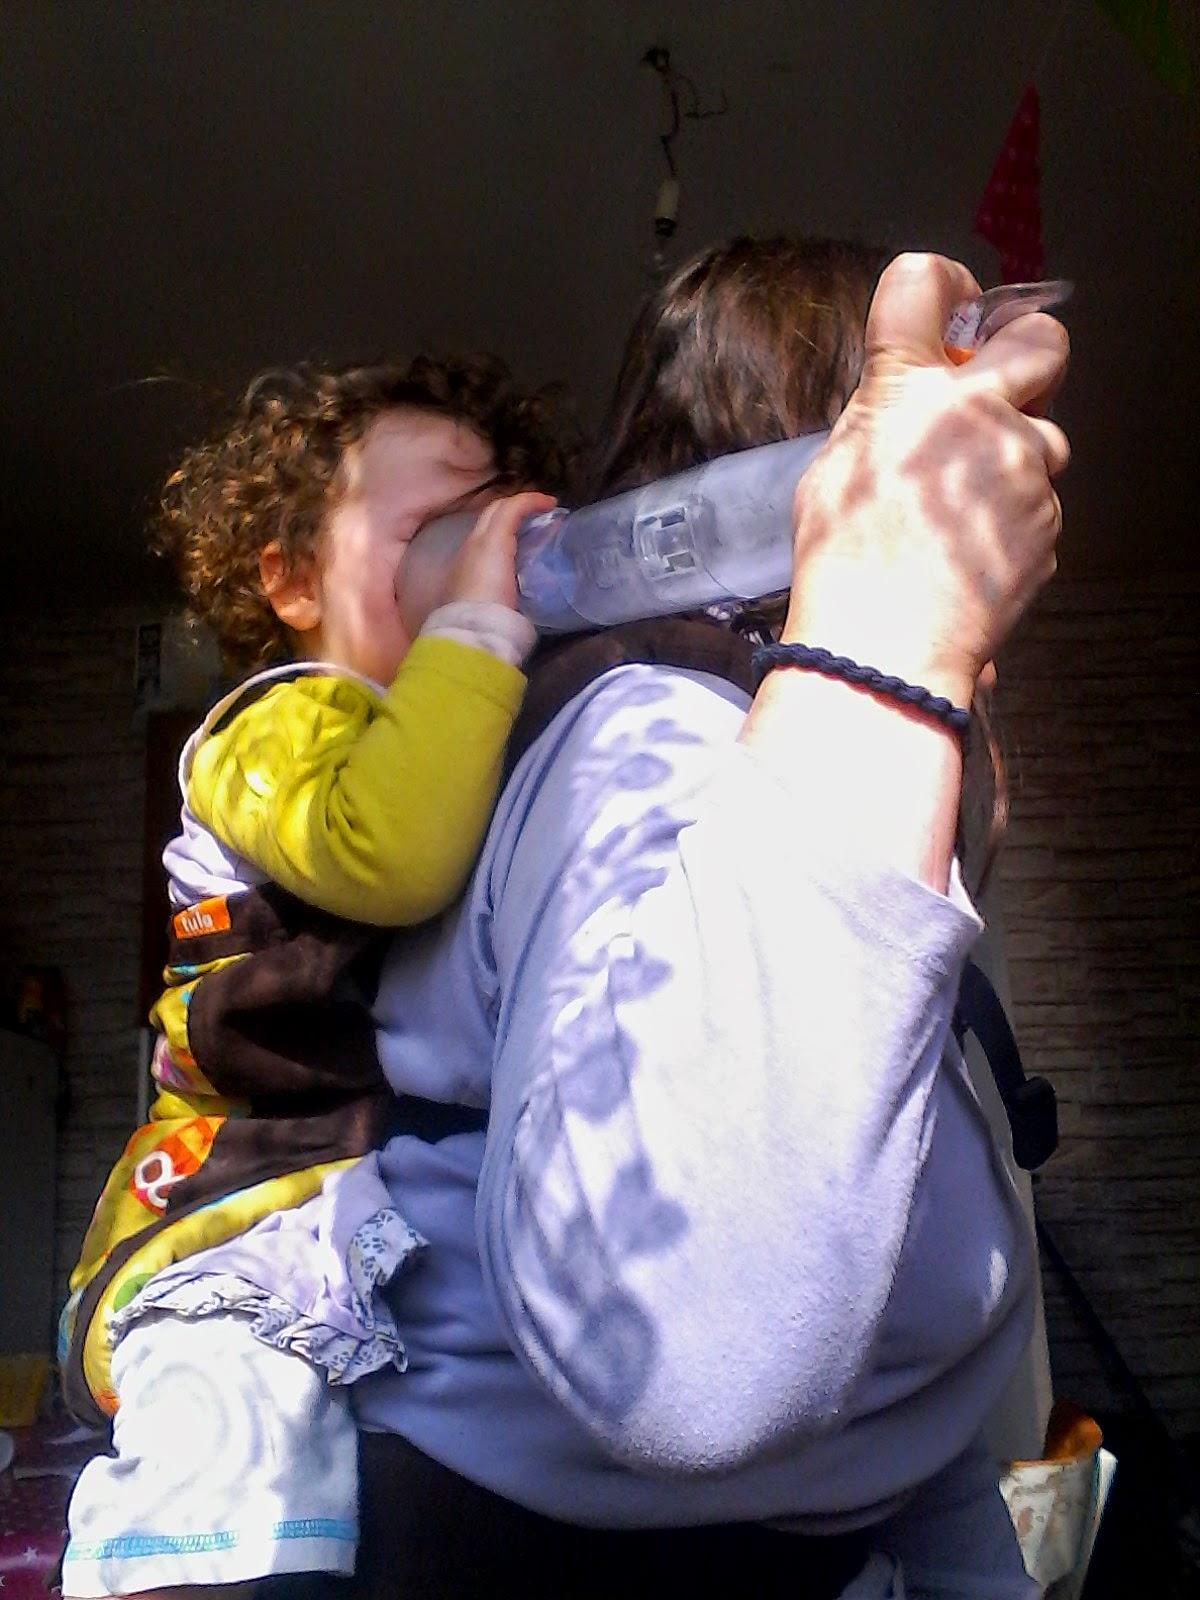 bronchiolite inhalateur portage BB Koala portage bienveillance éducation maman